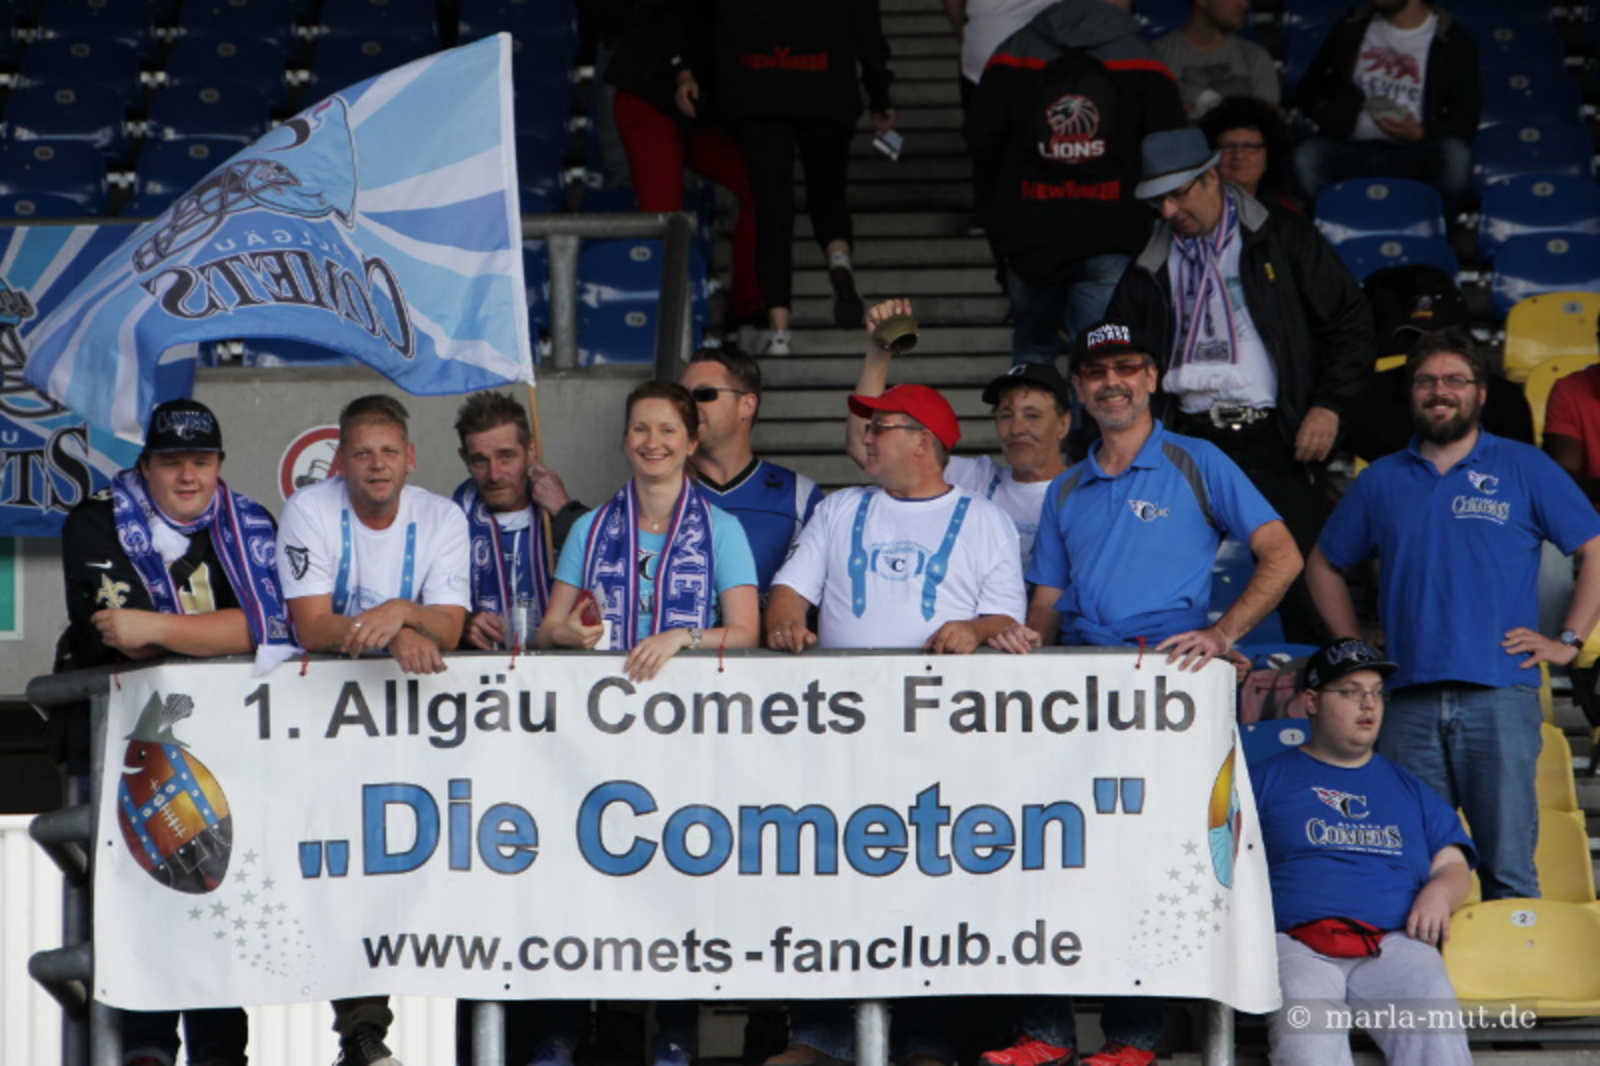 Marla Mut / Allgäu Comets